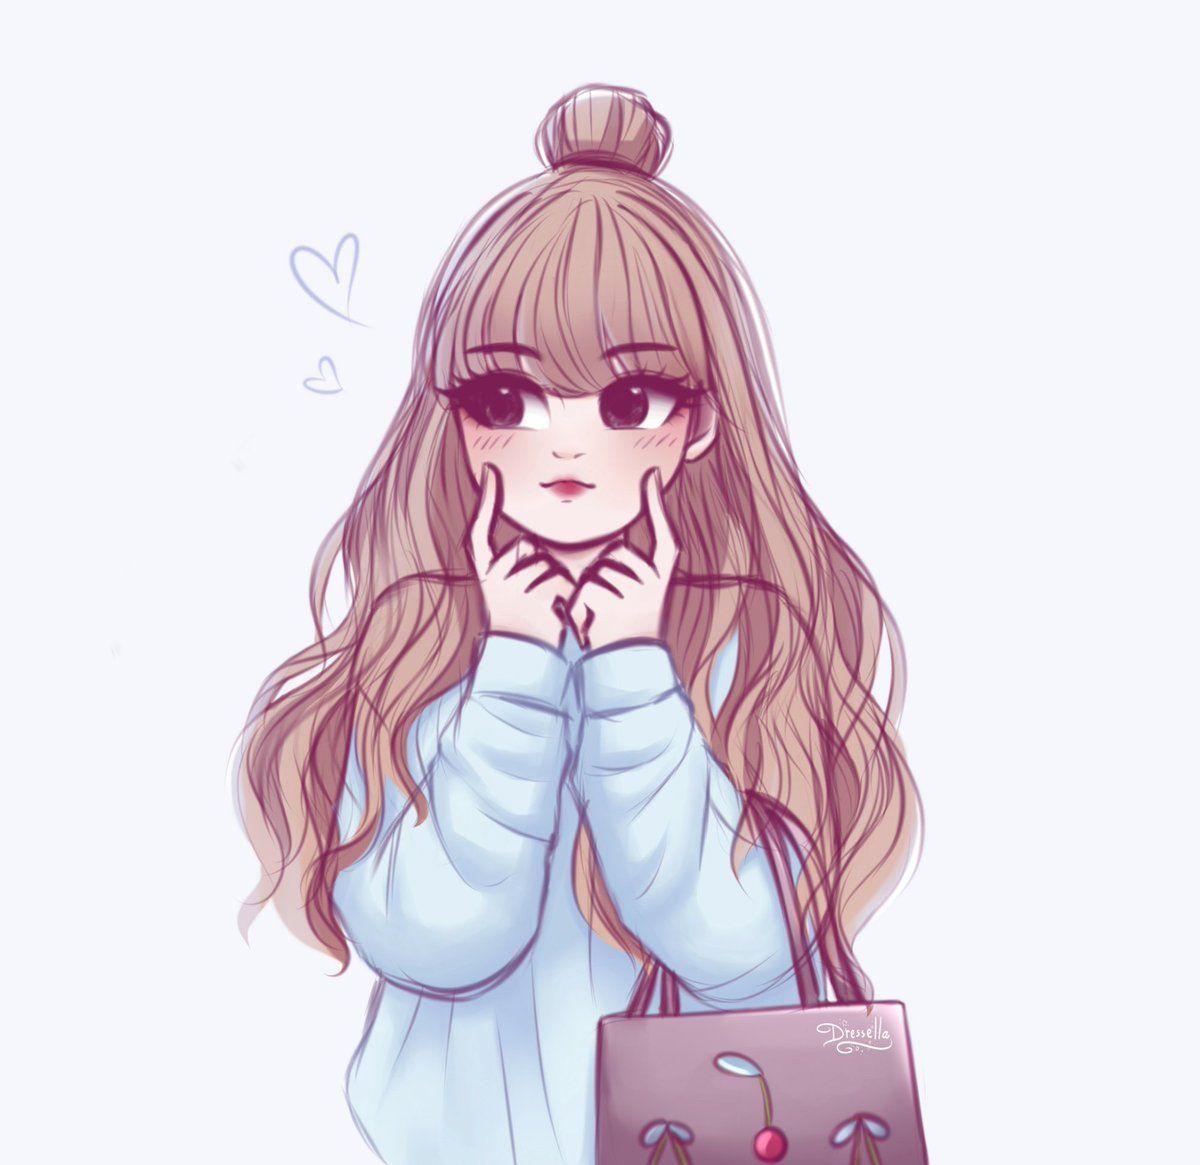 Blackpink Hashtag On Twitter Lisa Blackpink Wallpaper Blackpink Cute Girl Drawing